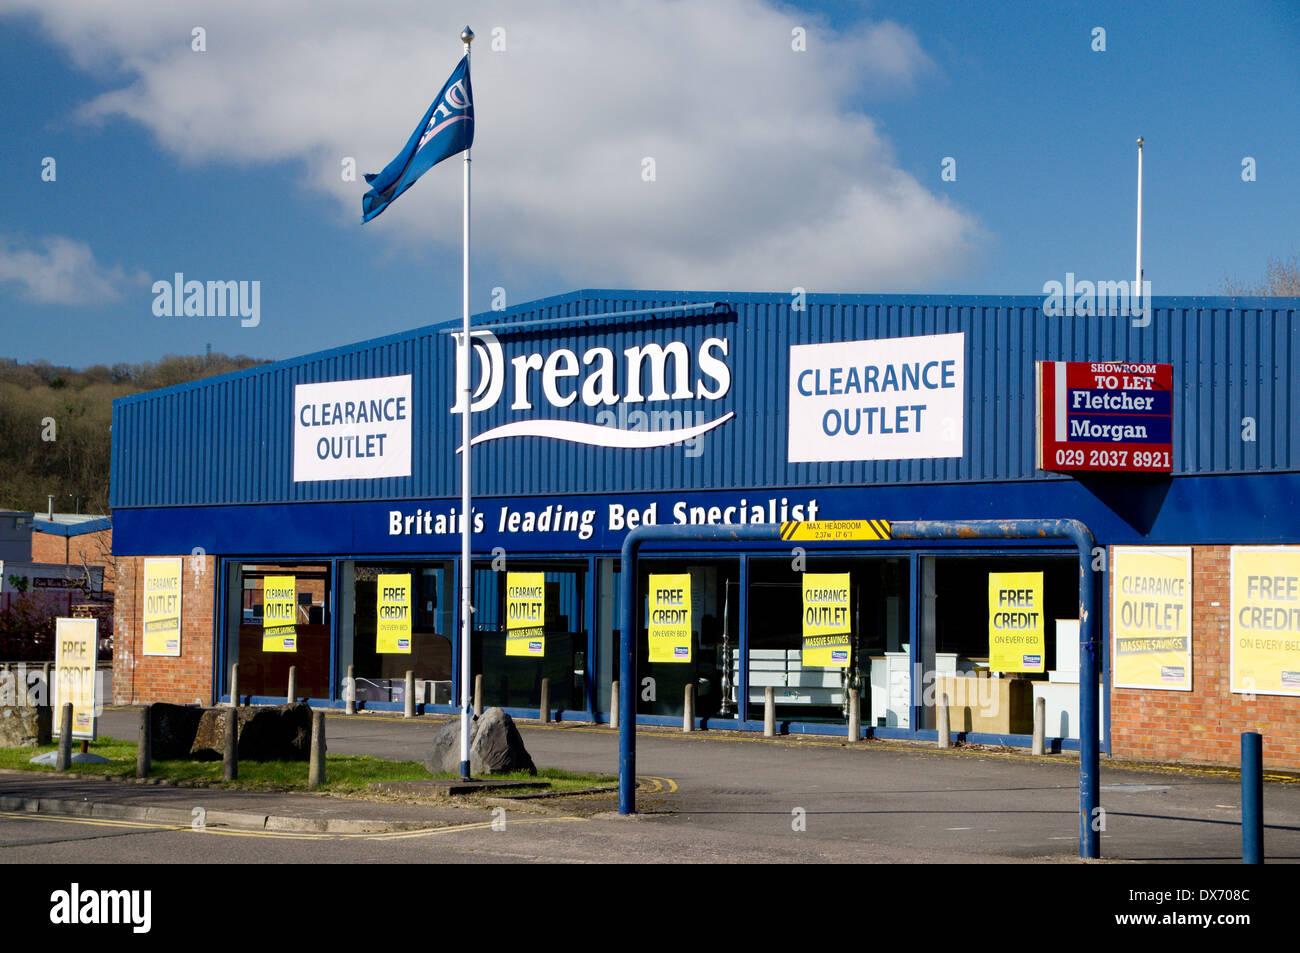 Dreams Bed Showrooms Penarth Road Cardiff Wales